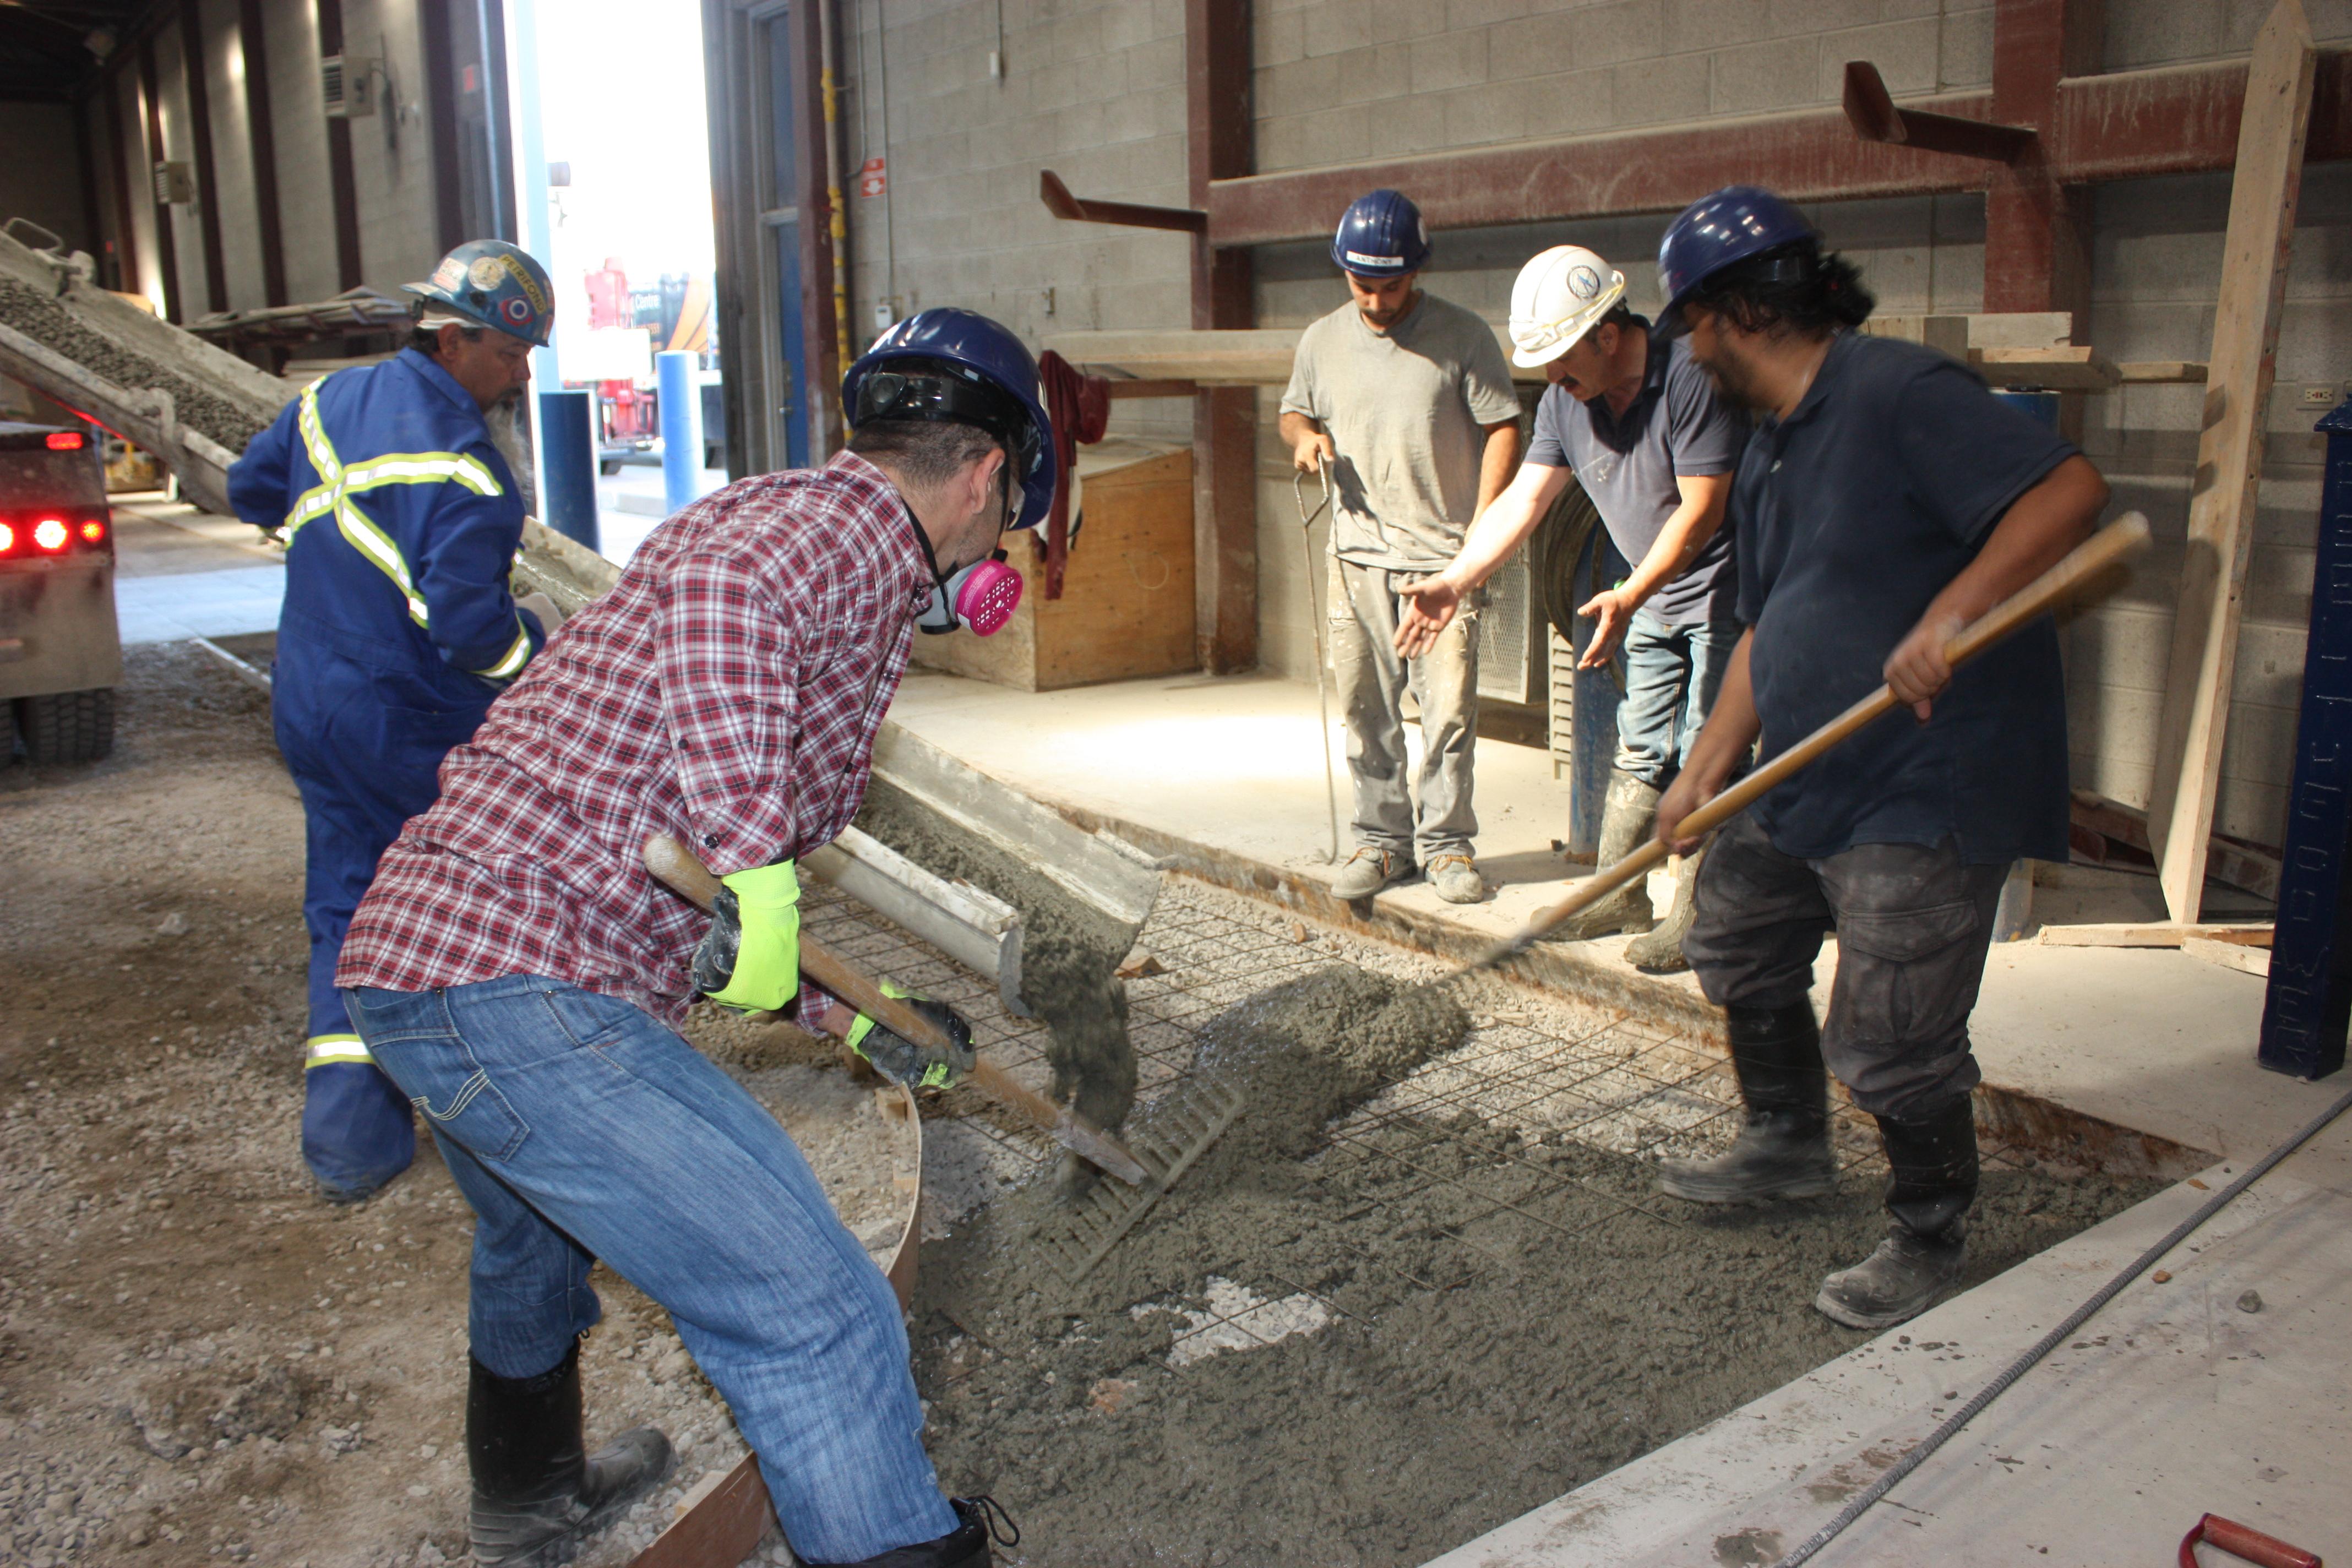 Apprenticeship programs liuna local 183 training centre cement finisher level 1 dailygadgetfo Images